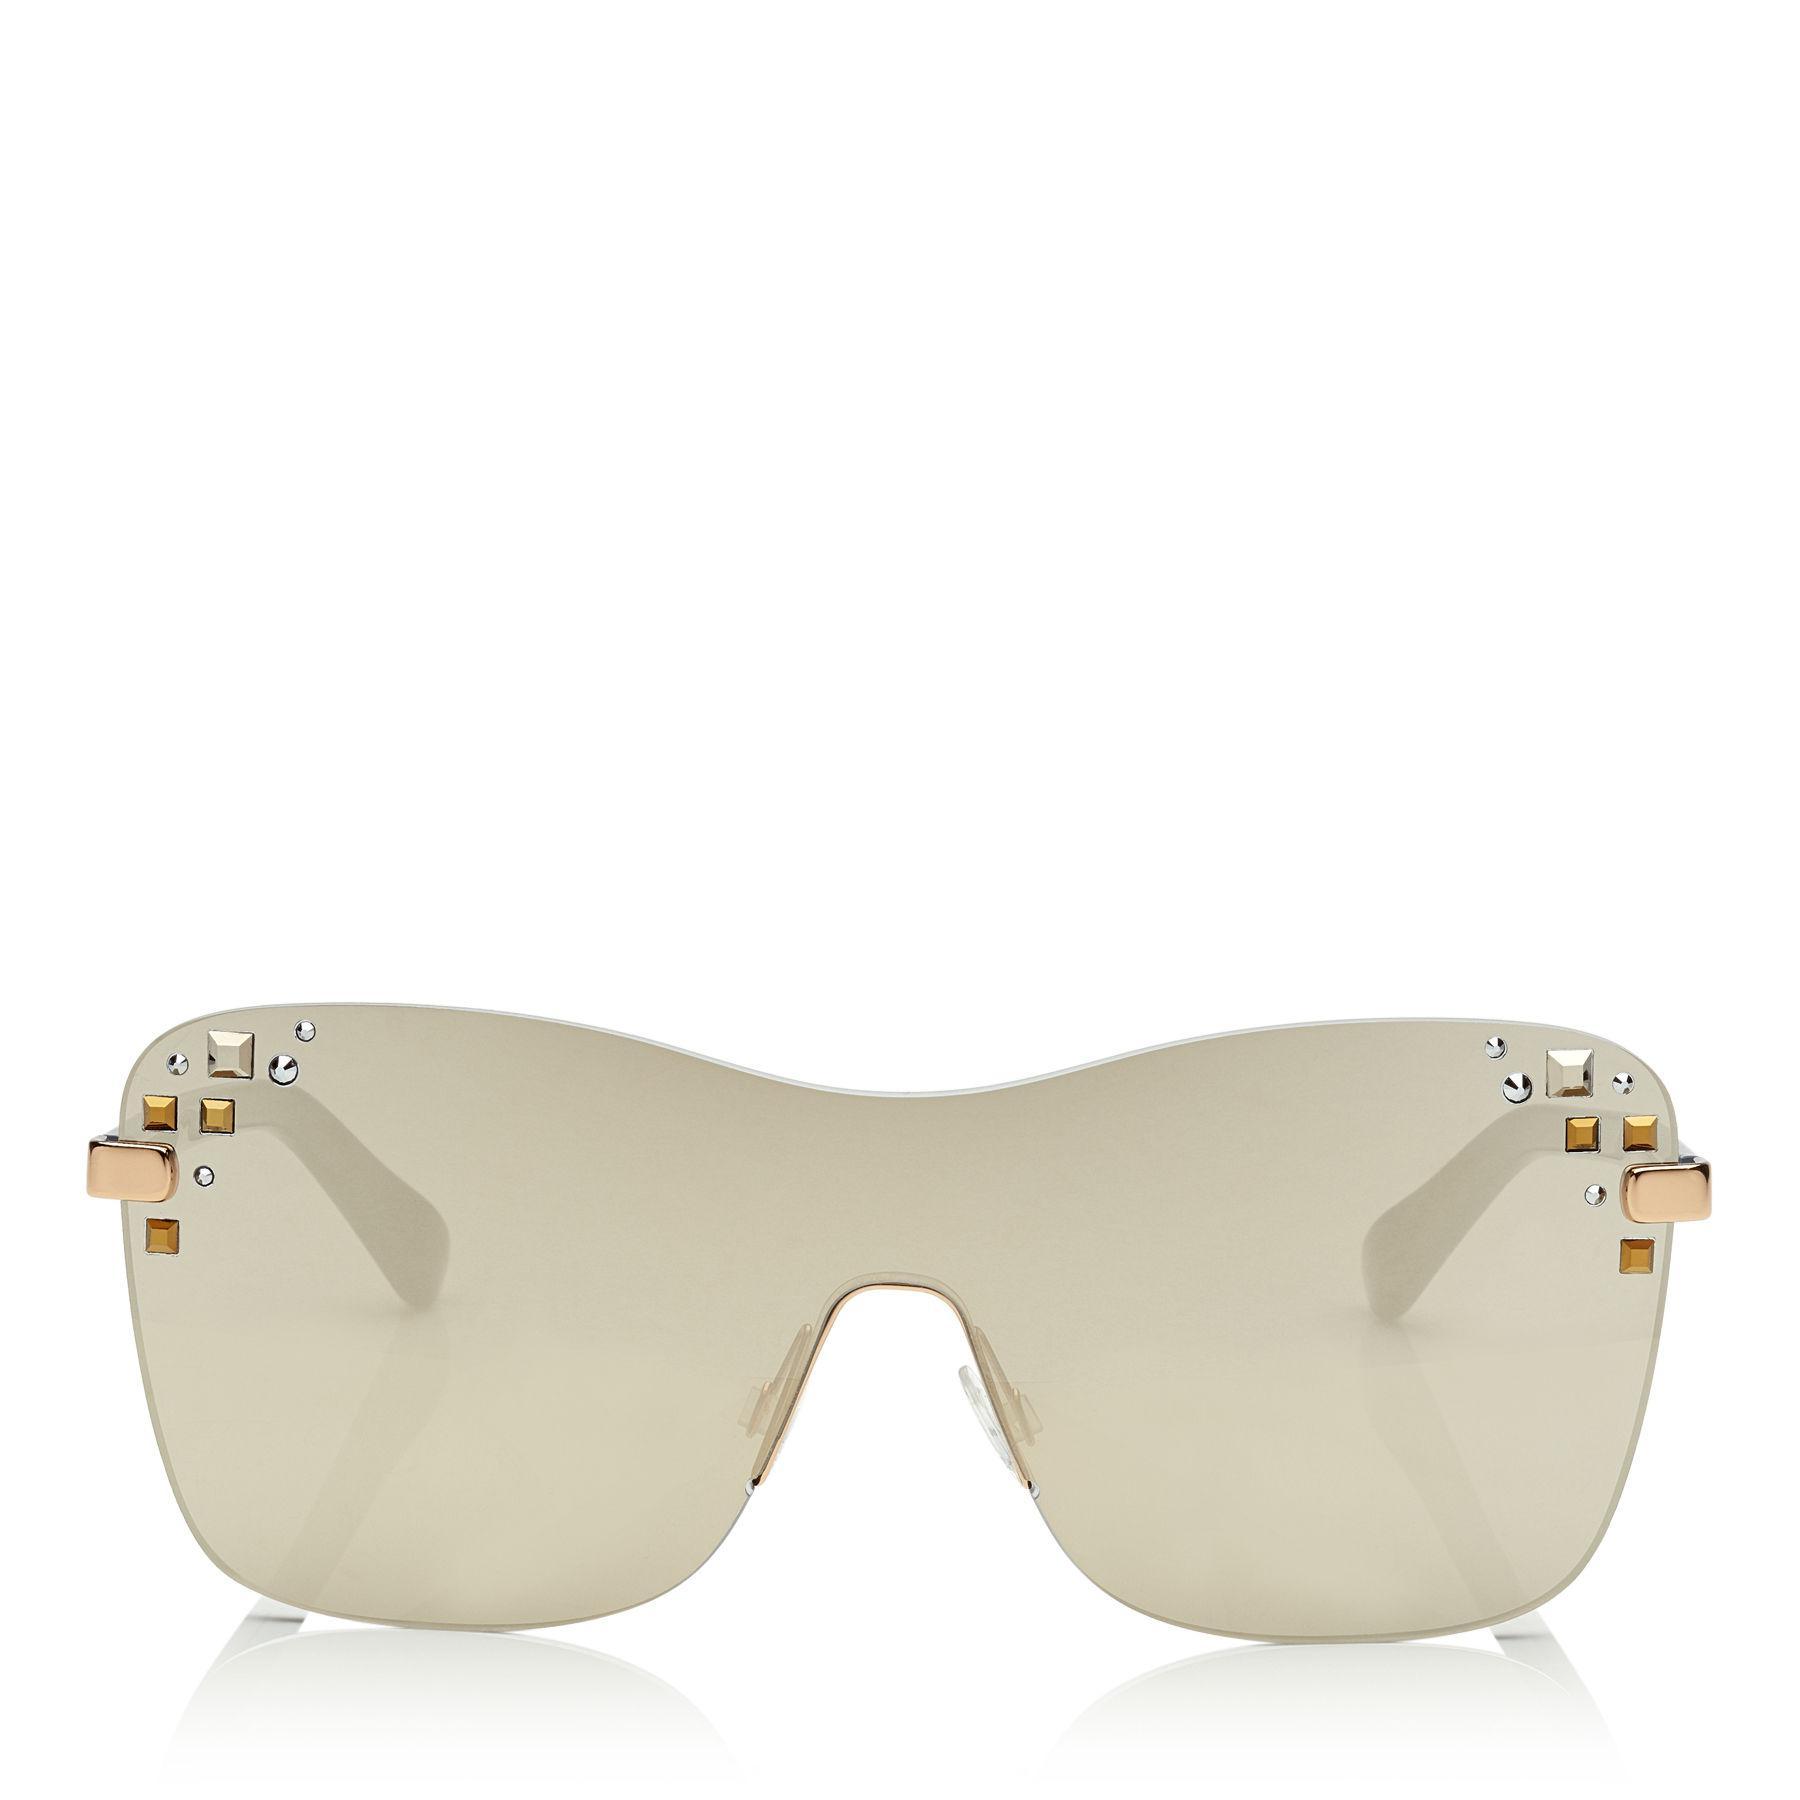 Jimmy Choo Masks Mirrored Swarovski® Shield Sunglasses